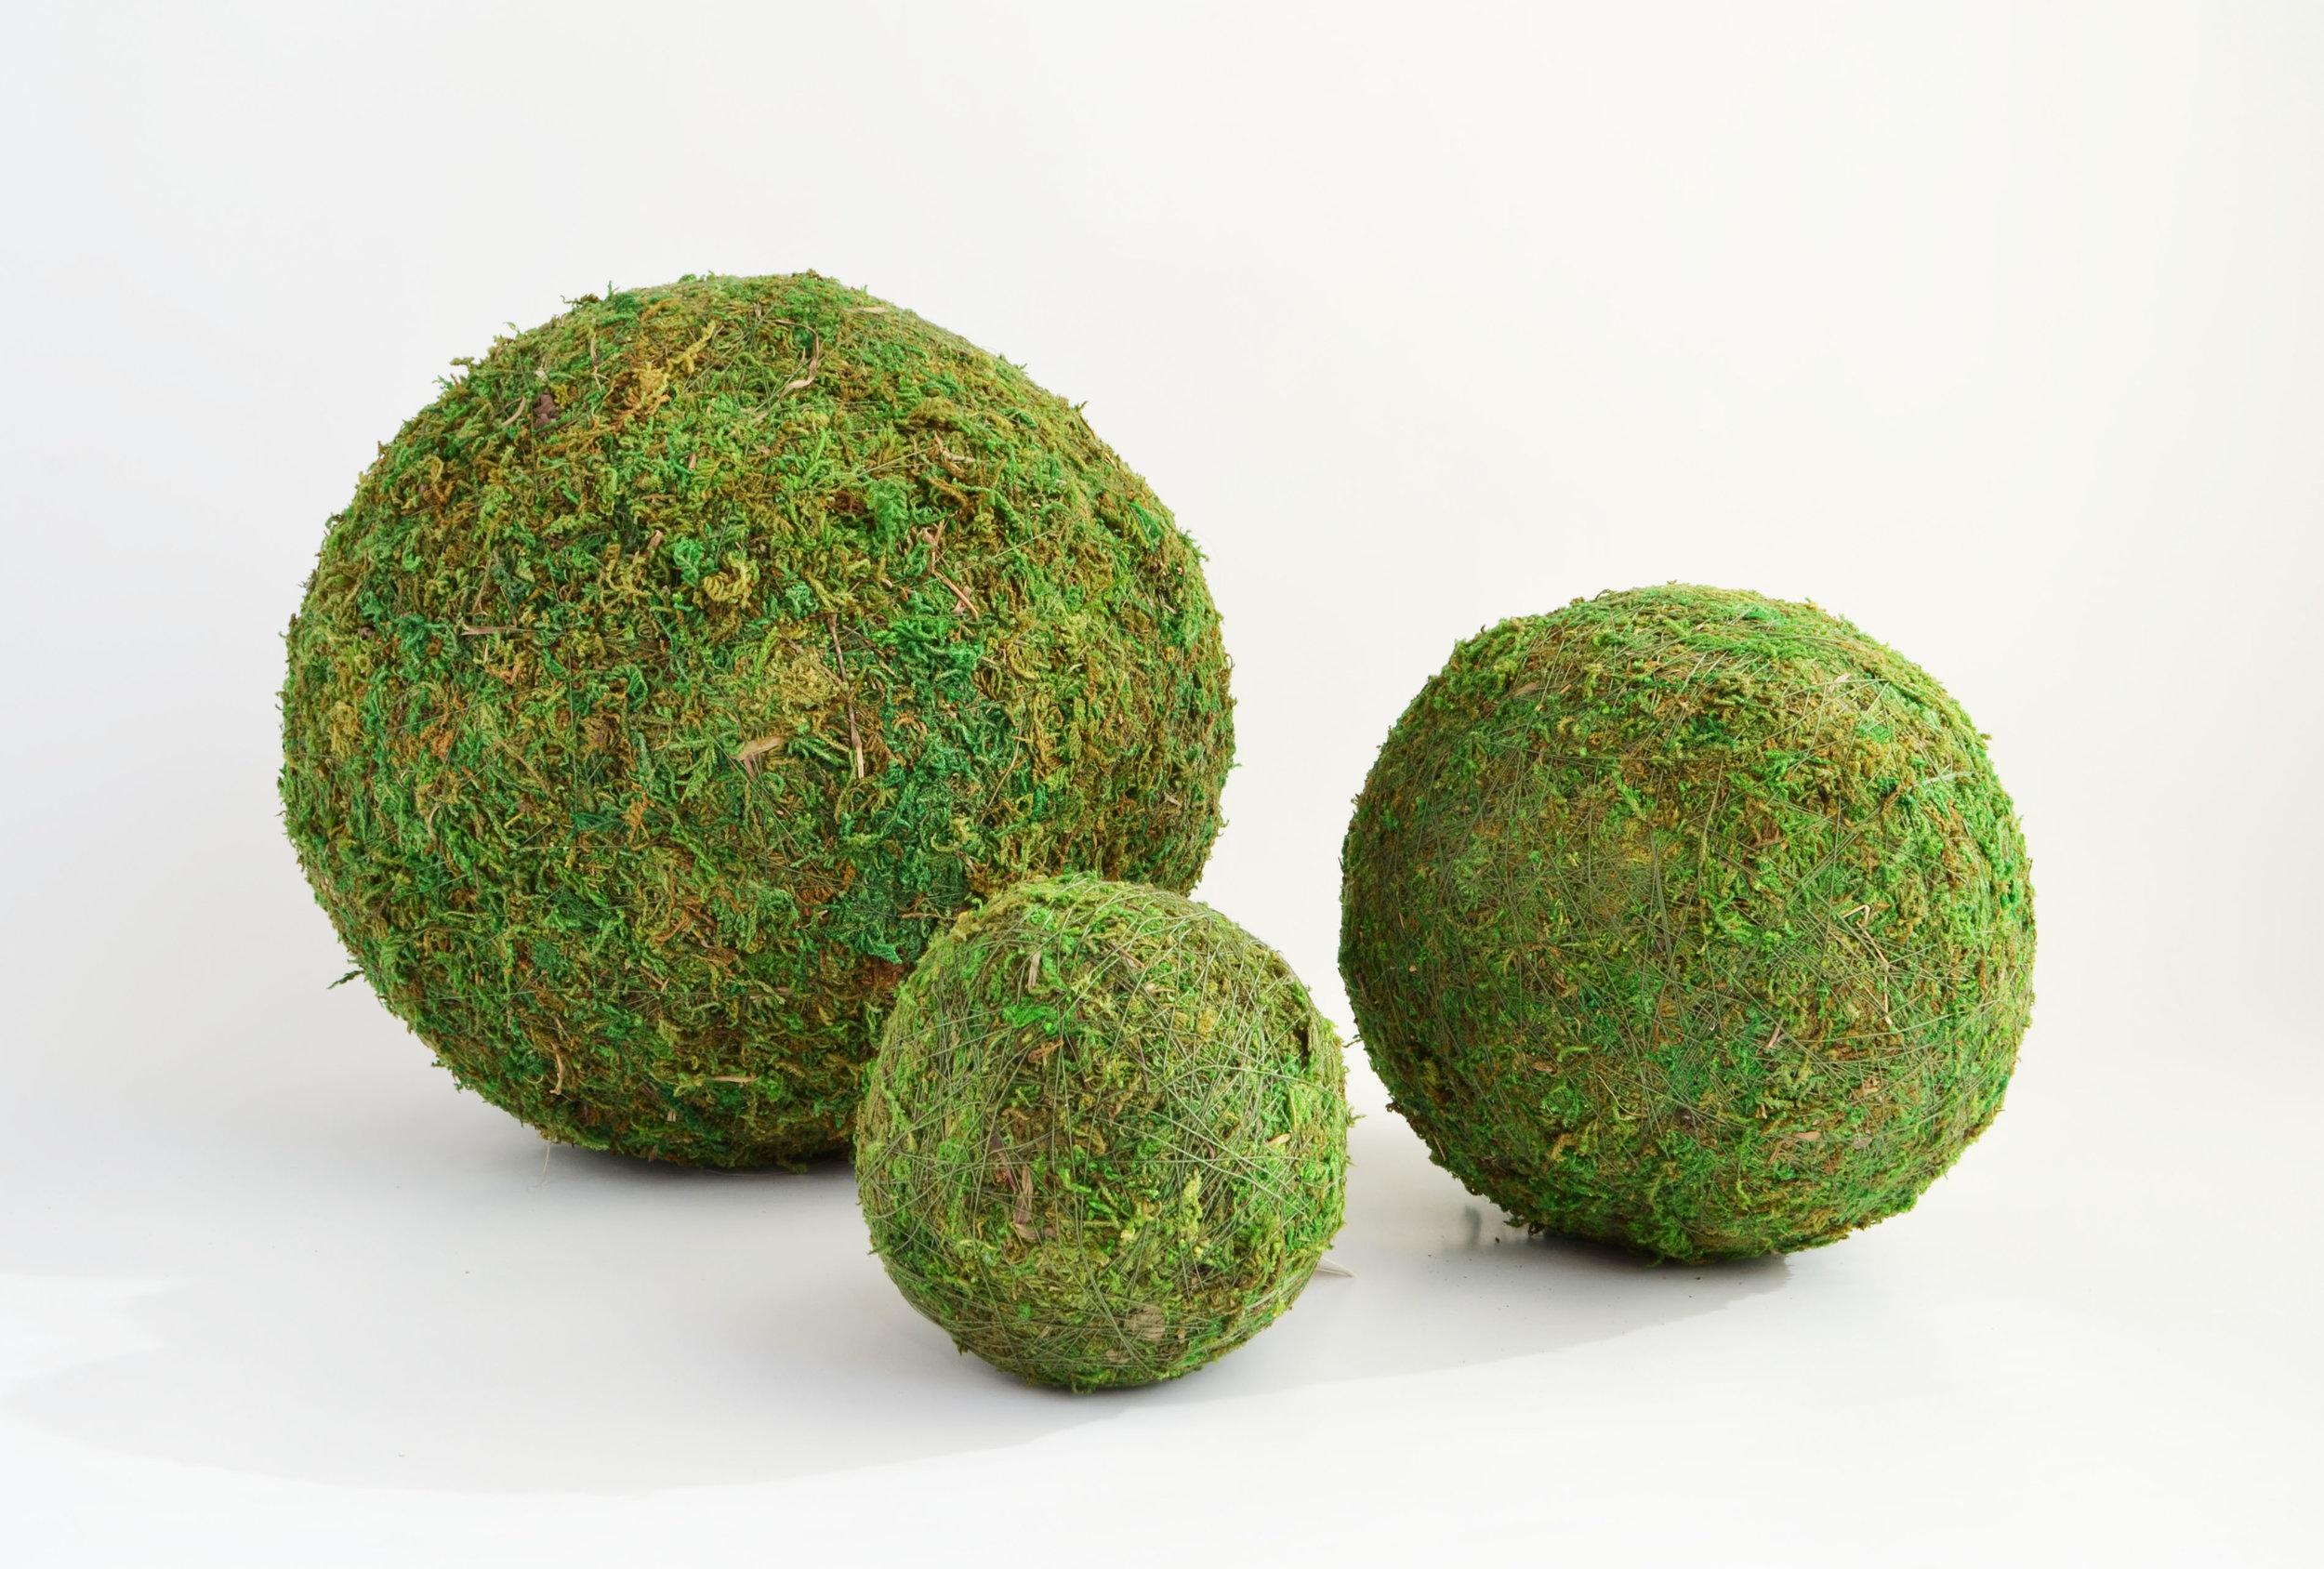 "artificial moss balls - 12"",6"",4""   Quantity: L (20) - M (20) - S (20)  Price: $10.00 - $8.00 - $5.00"